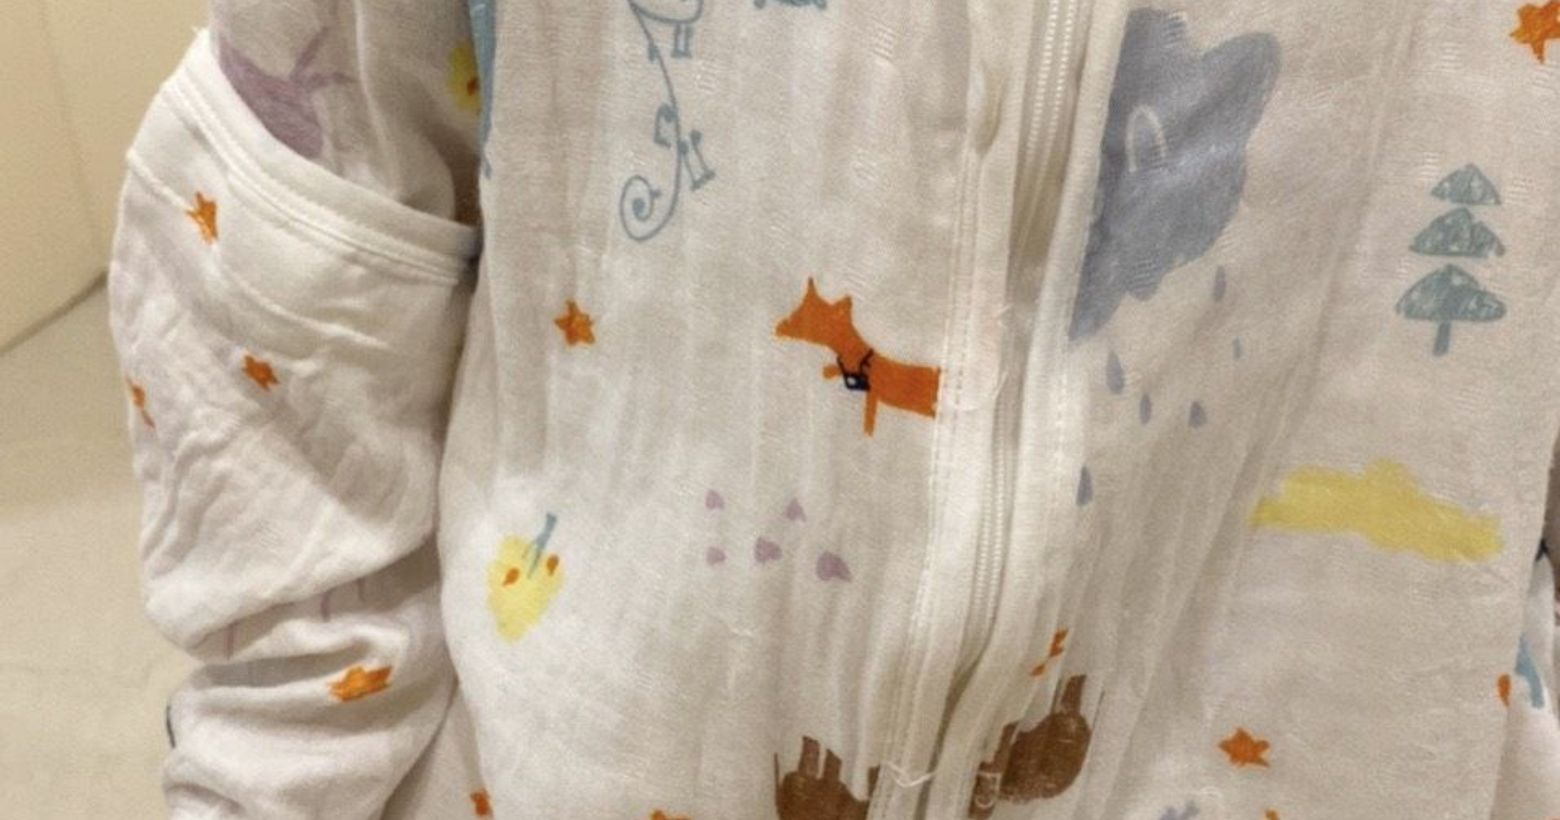 CT-Shop小城市童裝 一年四季都適穿 好品質多功能睡衣    內文俗語說小孩三把火,不管天氣怎麼